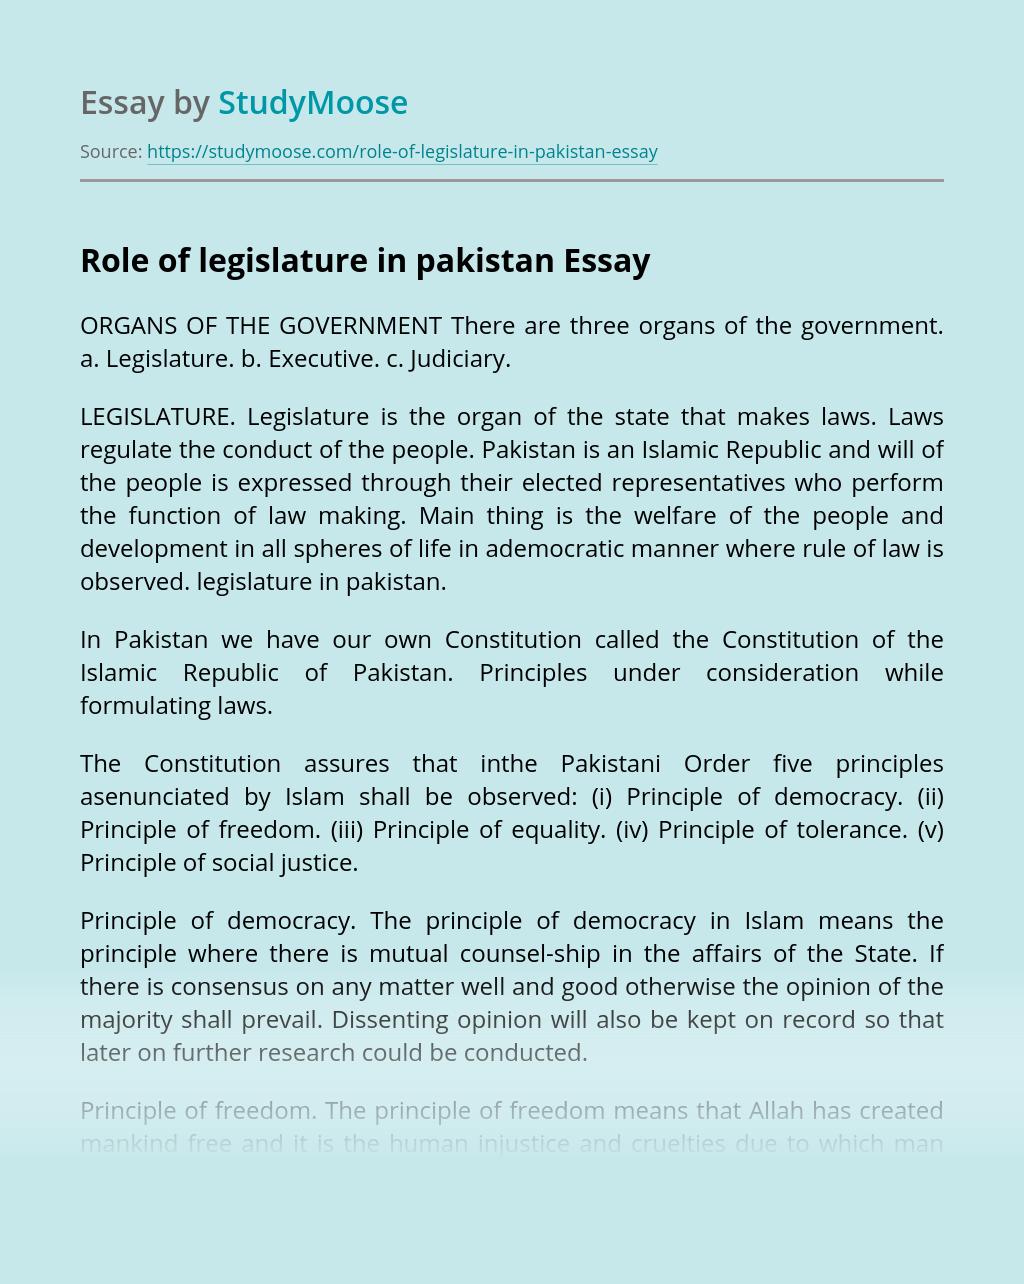 Role of legislature in pakistan